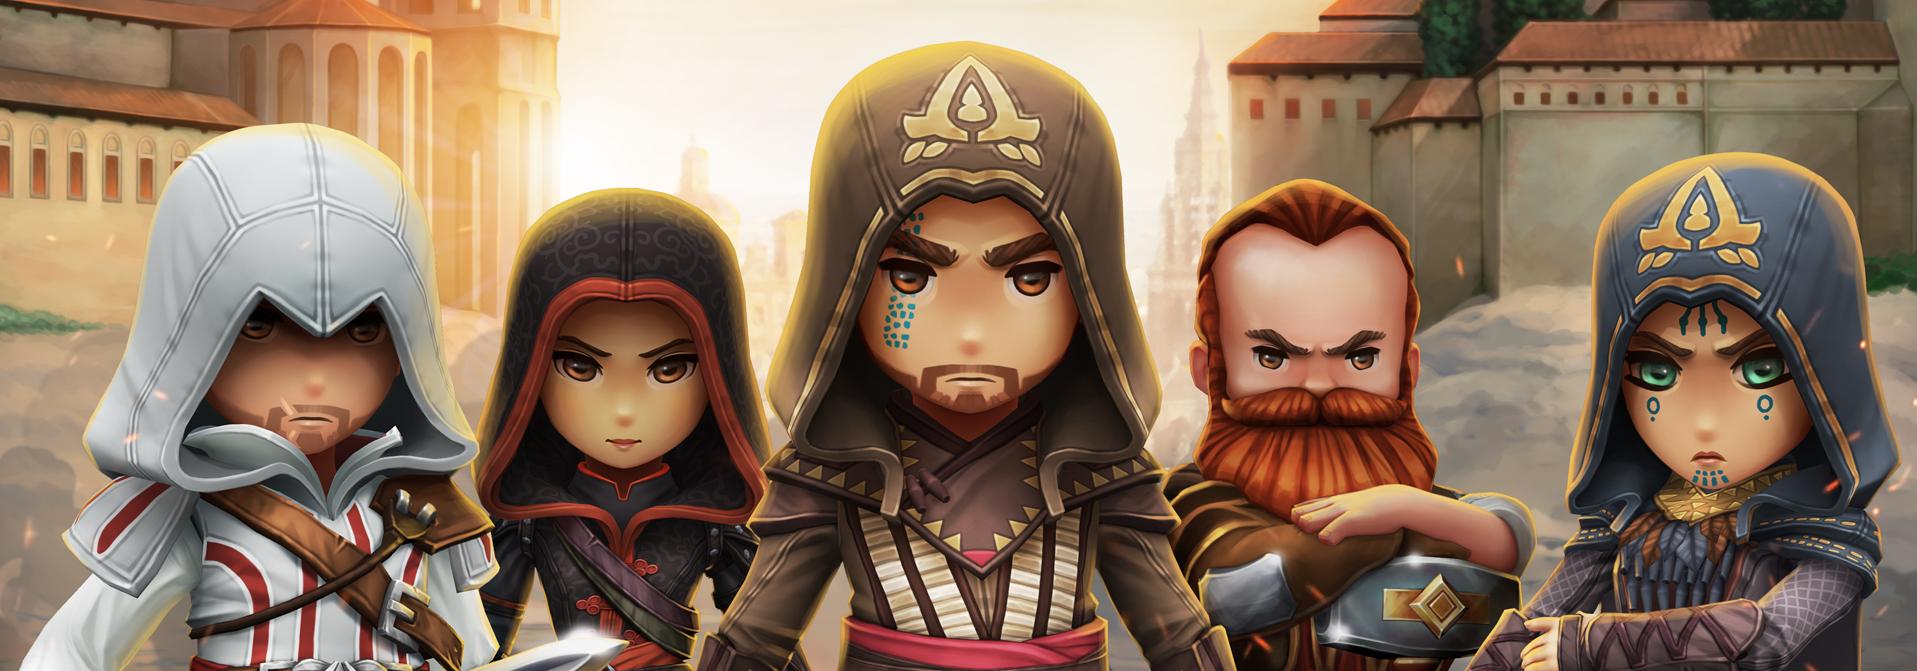 Assassin's Creed: Rebellion – Announcement Trailer